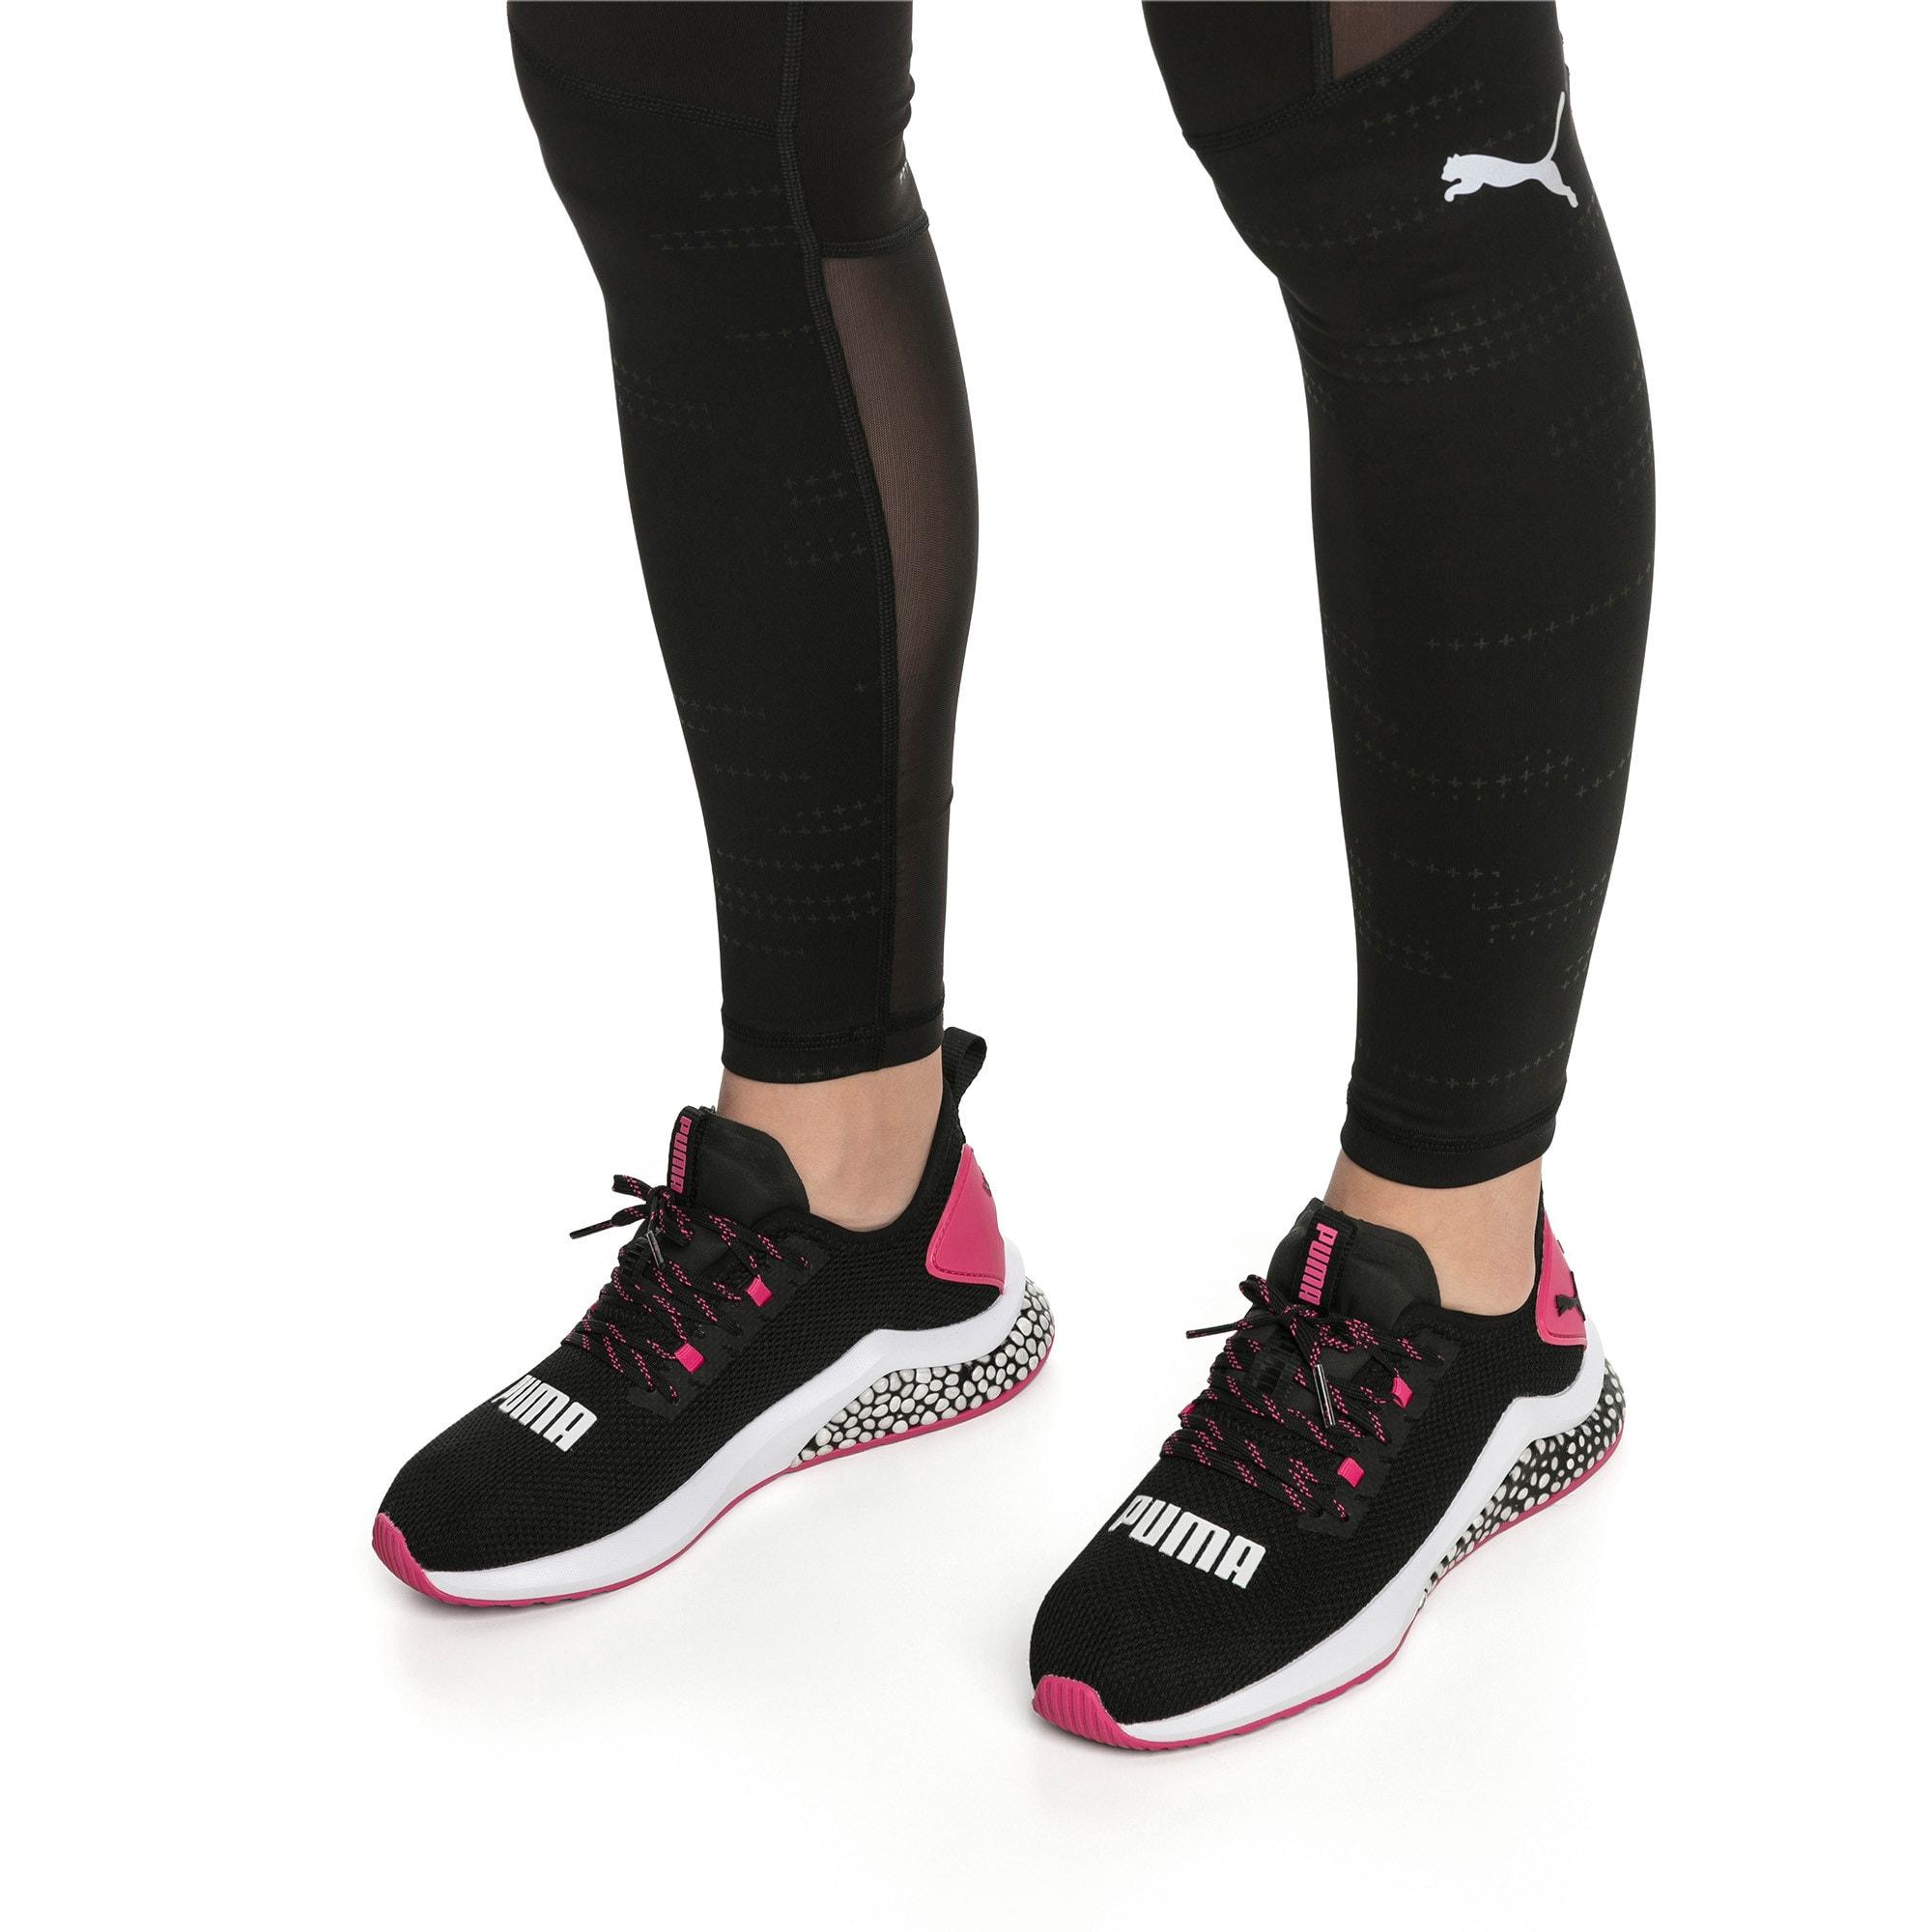 Thumbnail 2 of HYBRID NX Women's Running Shoes, Puma Black-Fuchsia Purple, medium